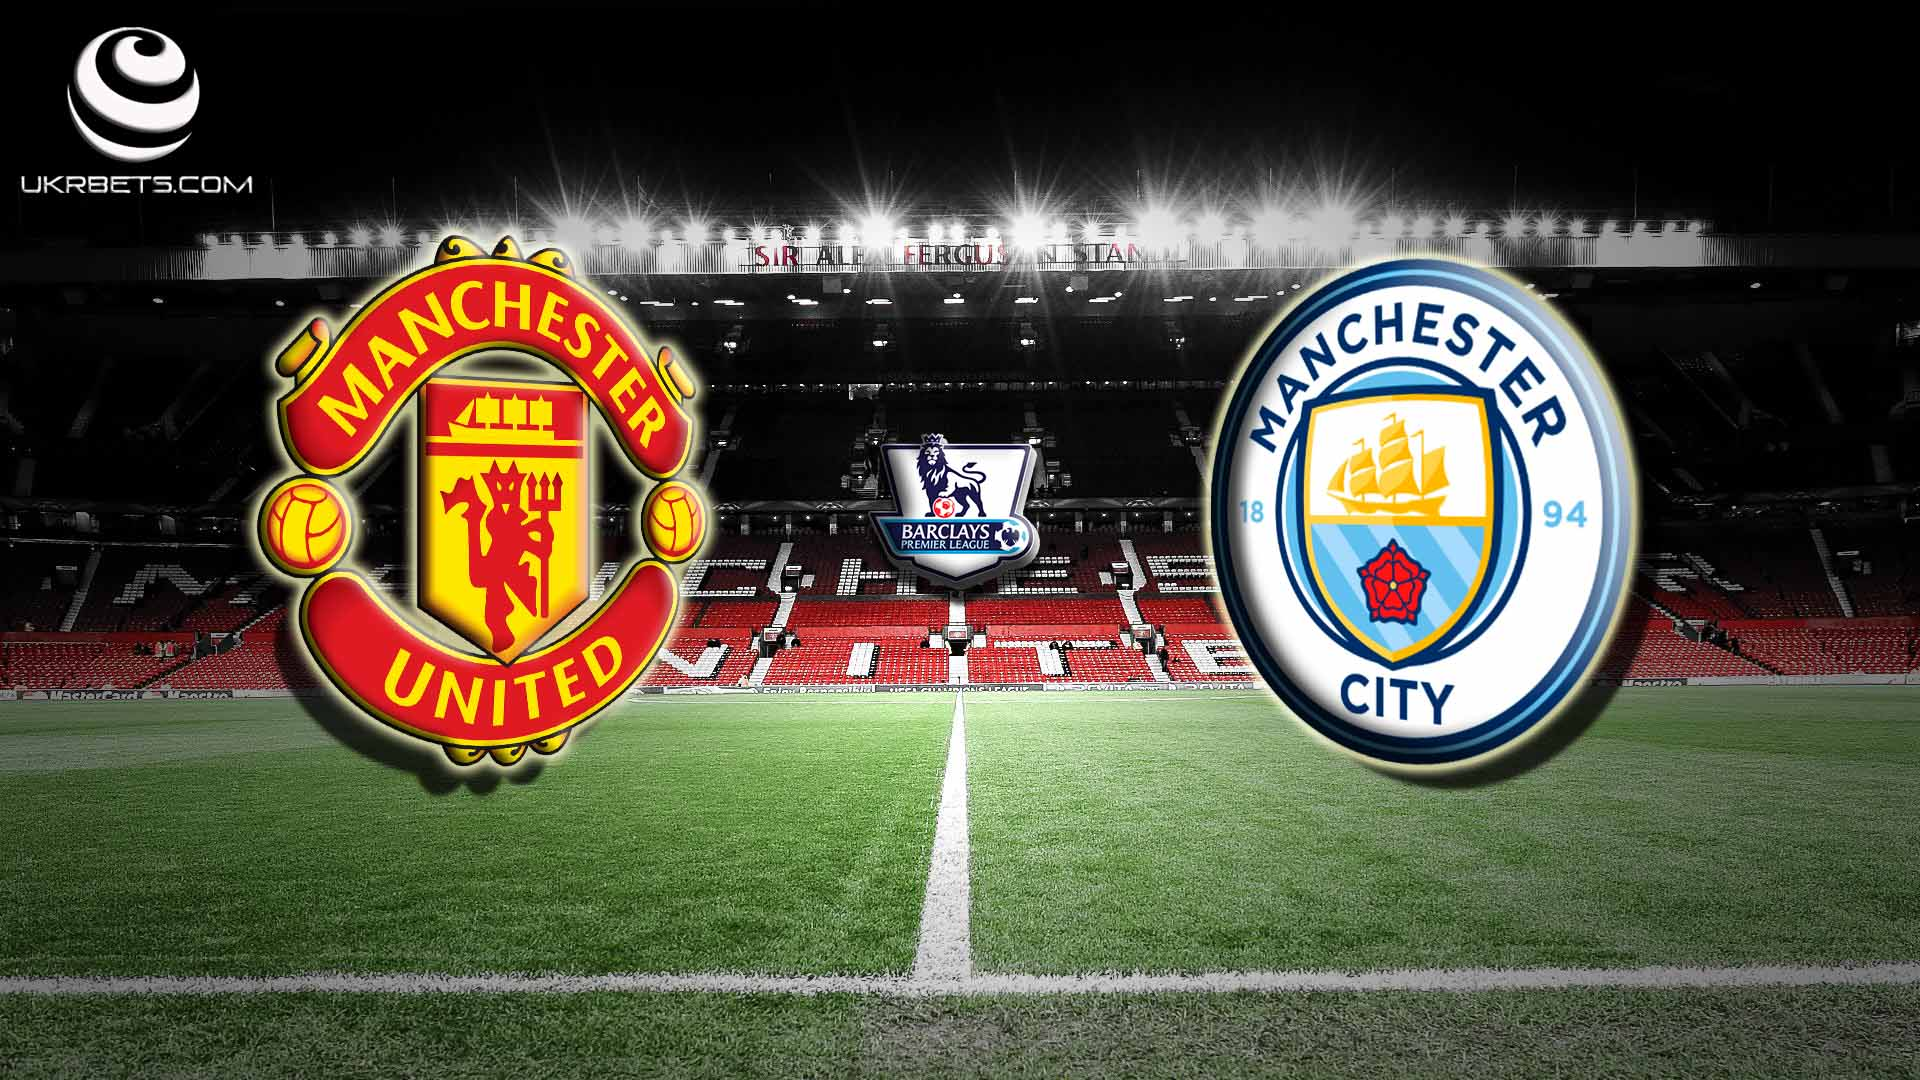 Прогноз на матч Манчестер Сити - Уотфорд 02 января 2018